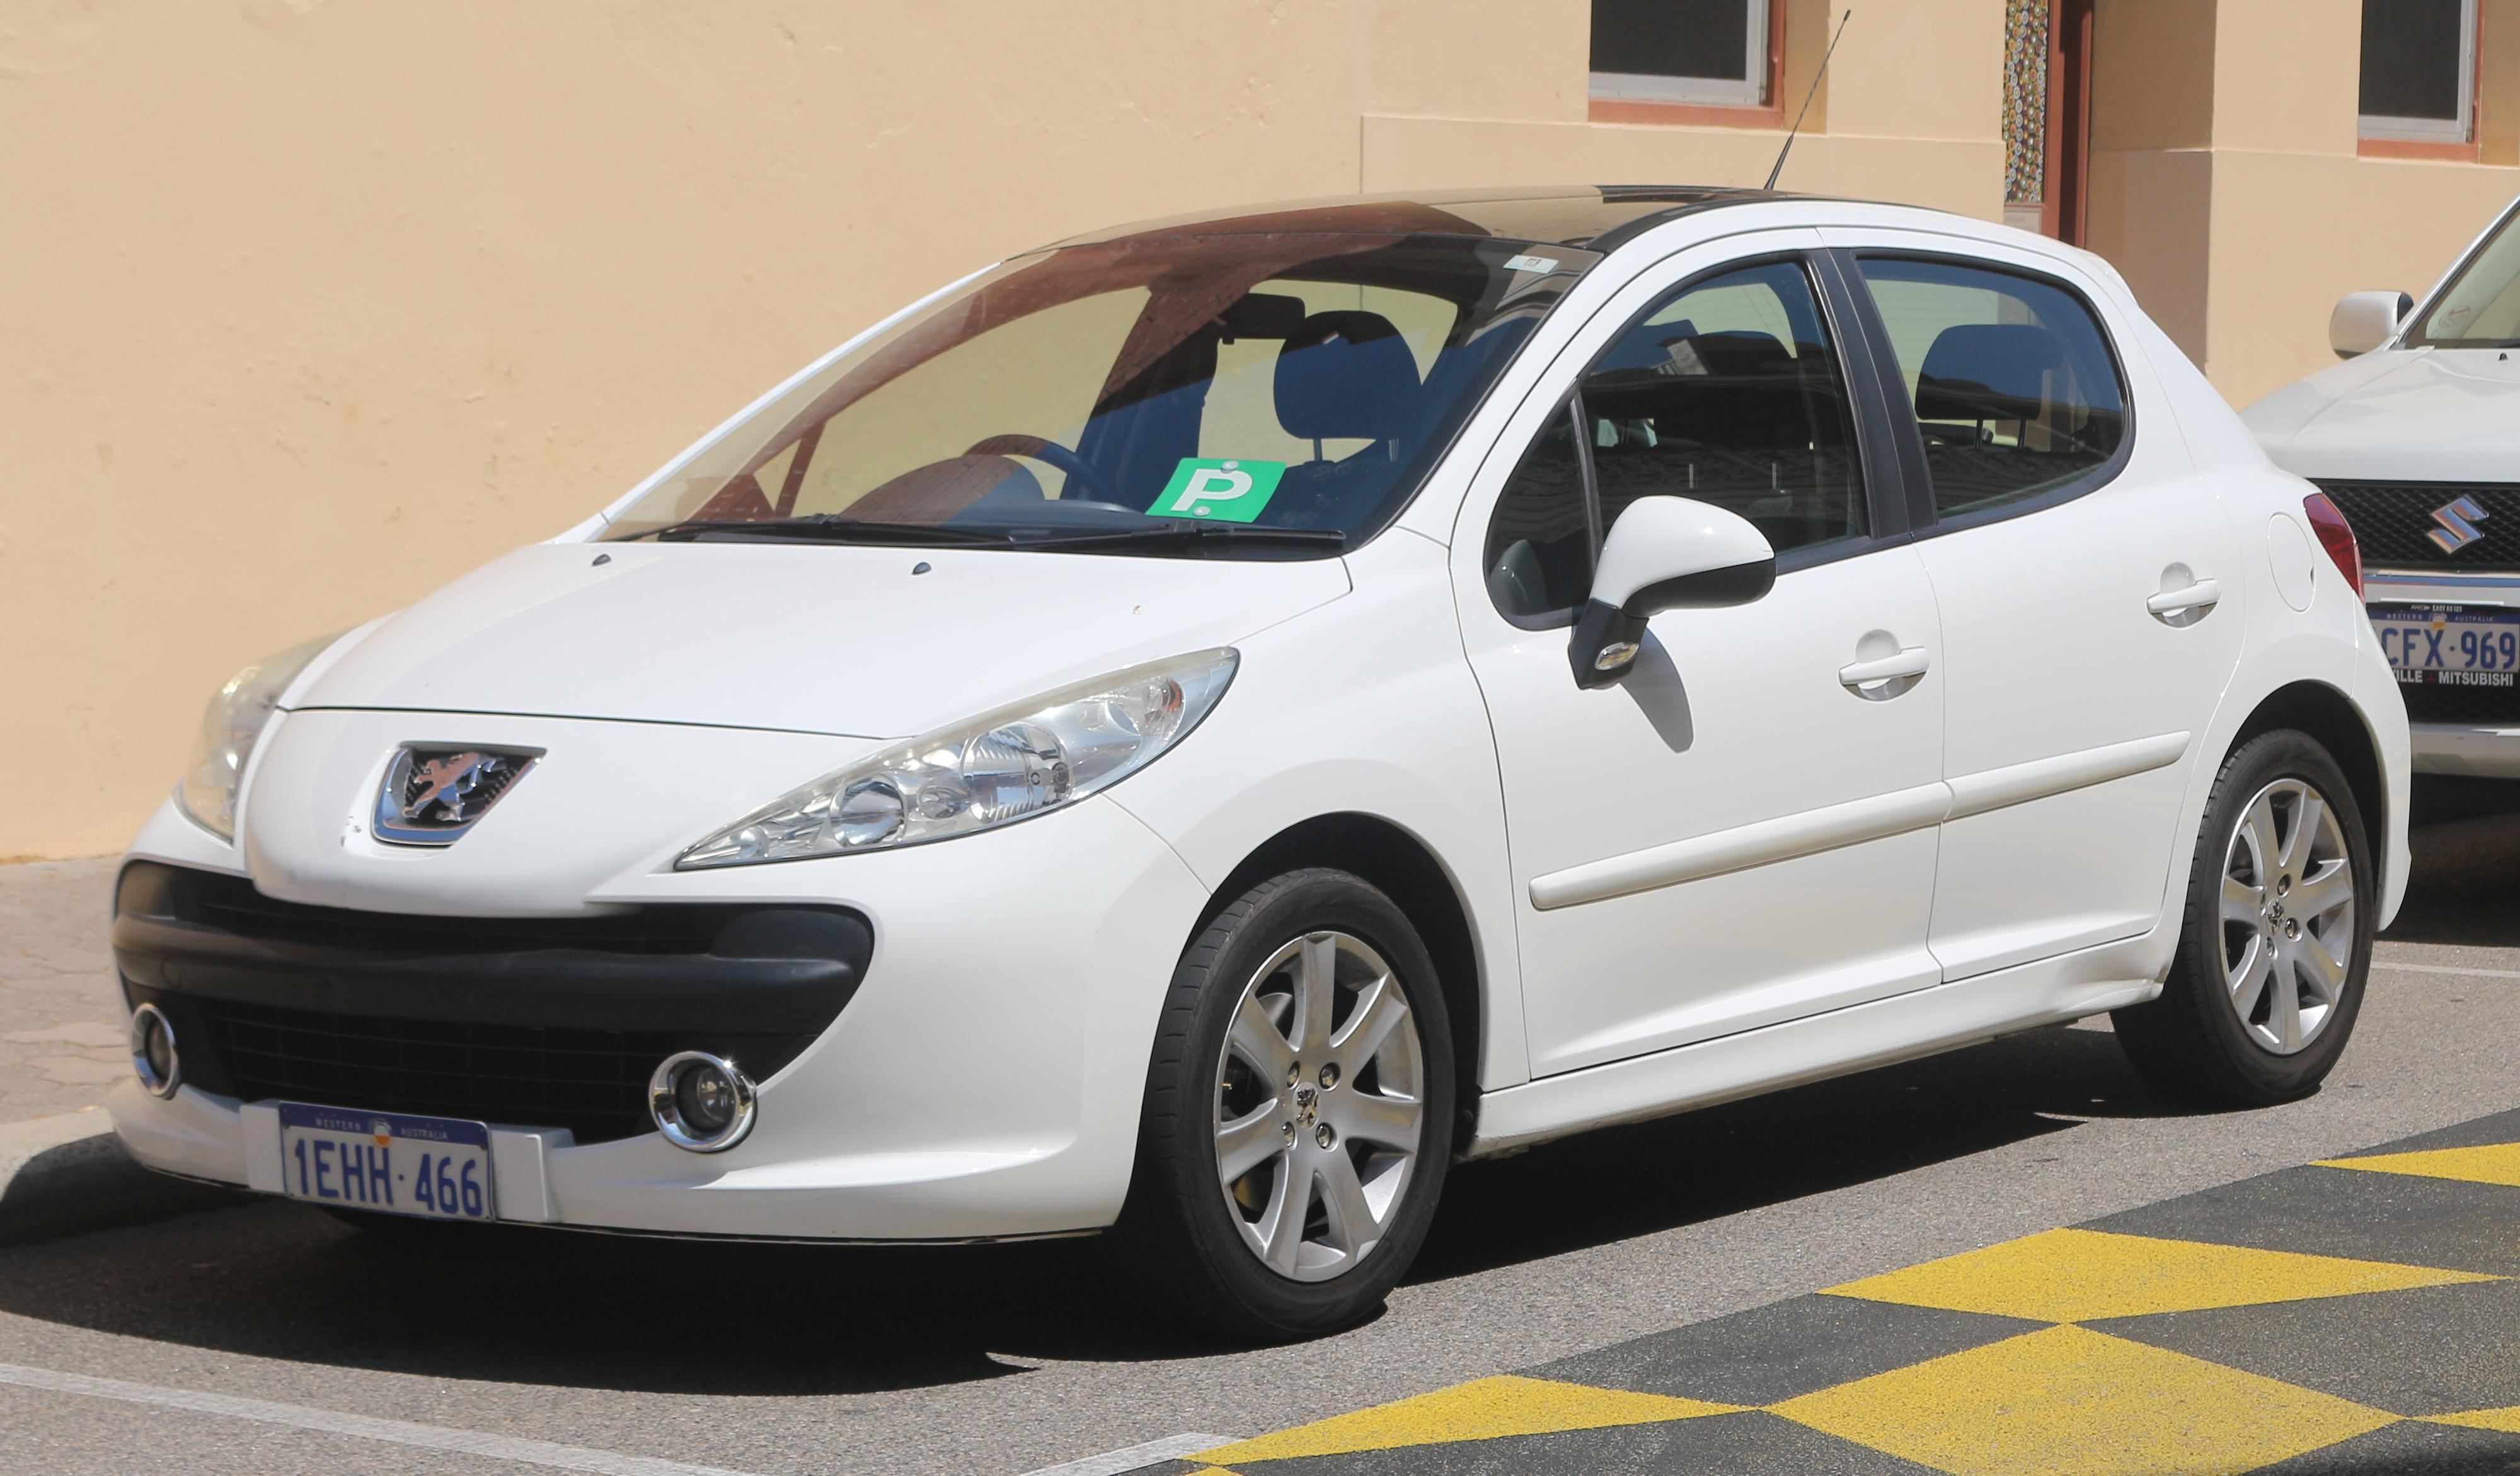 File:2007-2009 Peugeot 207 (A7) XE 5-door hatchback (2018-11-13) 01.jpg -  Wikimedia Commons